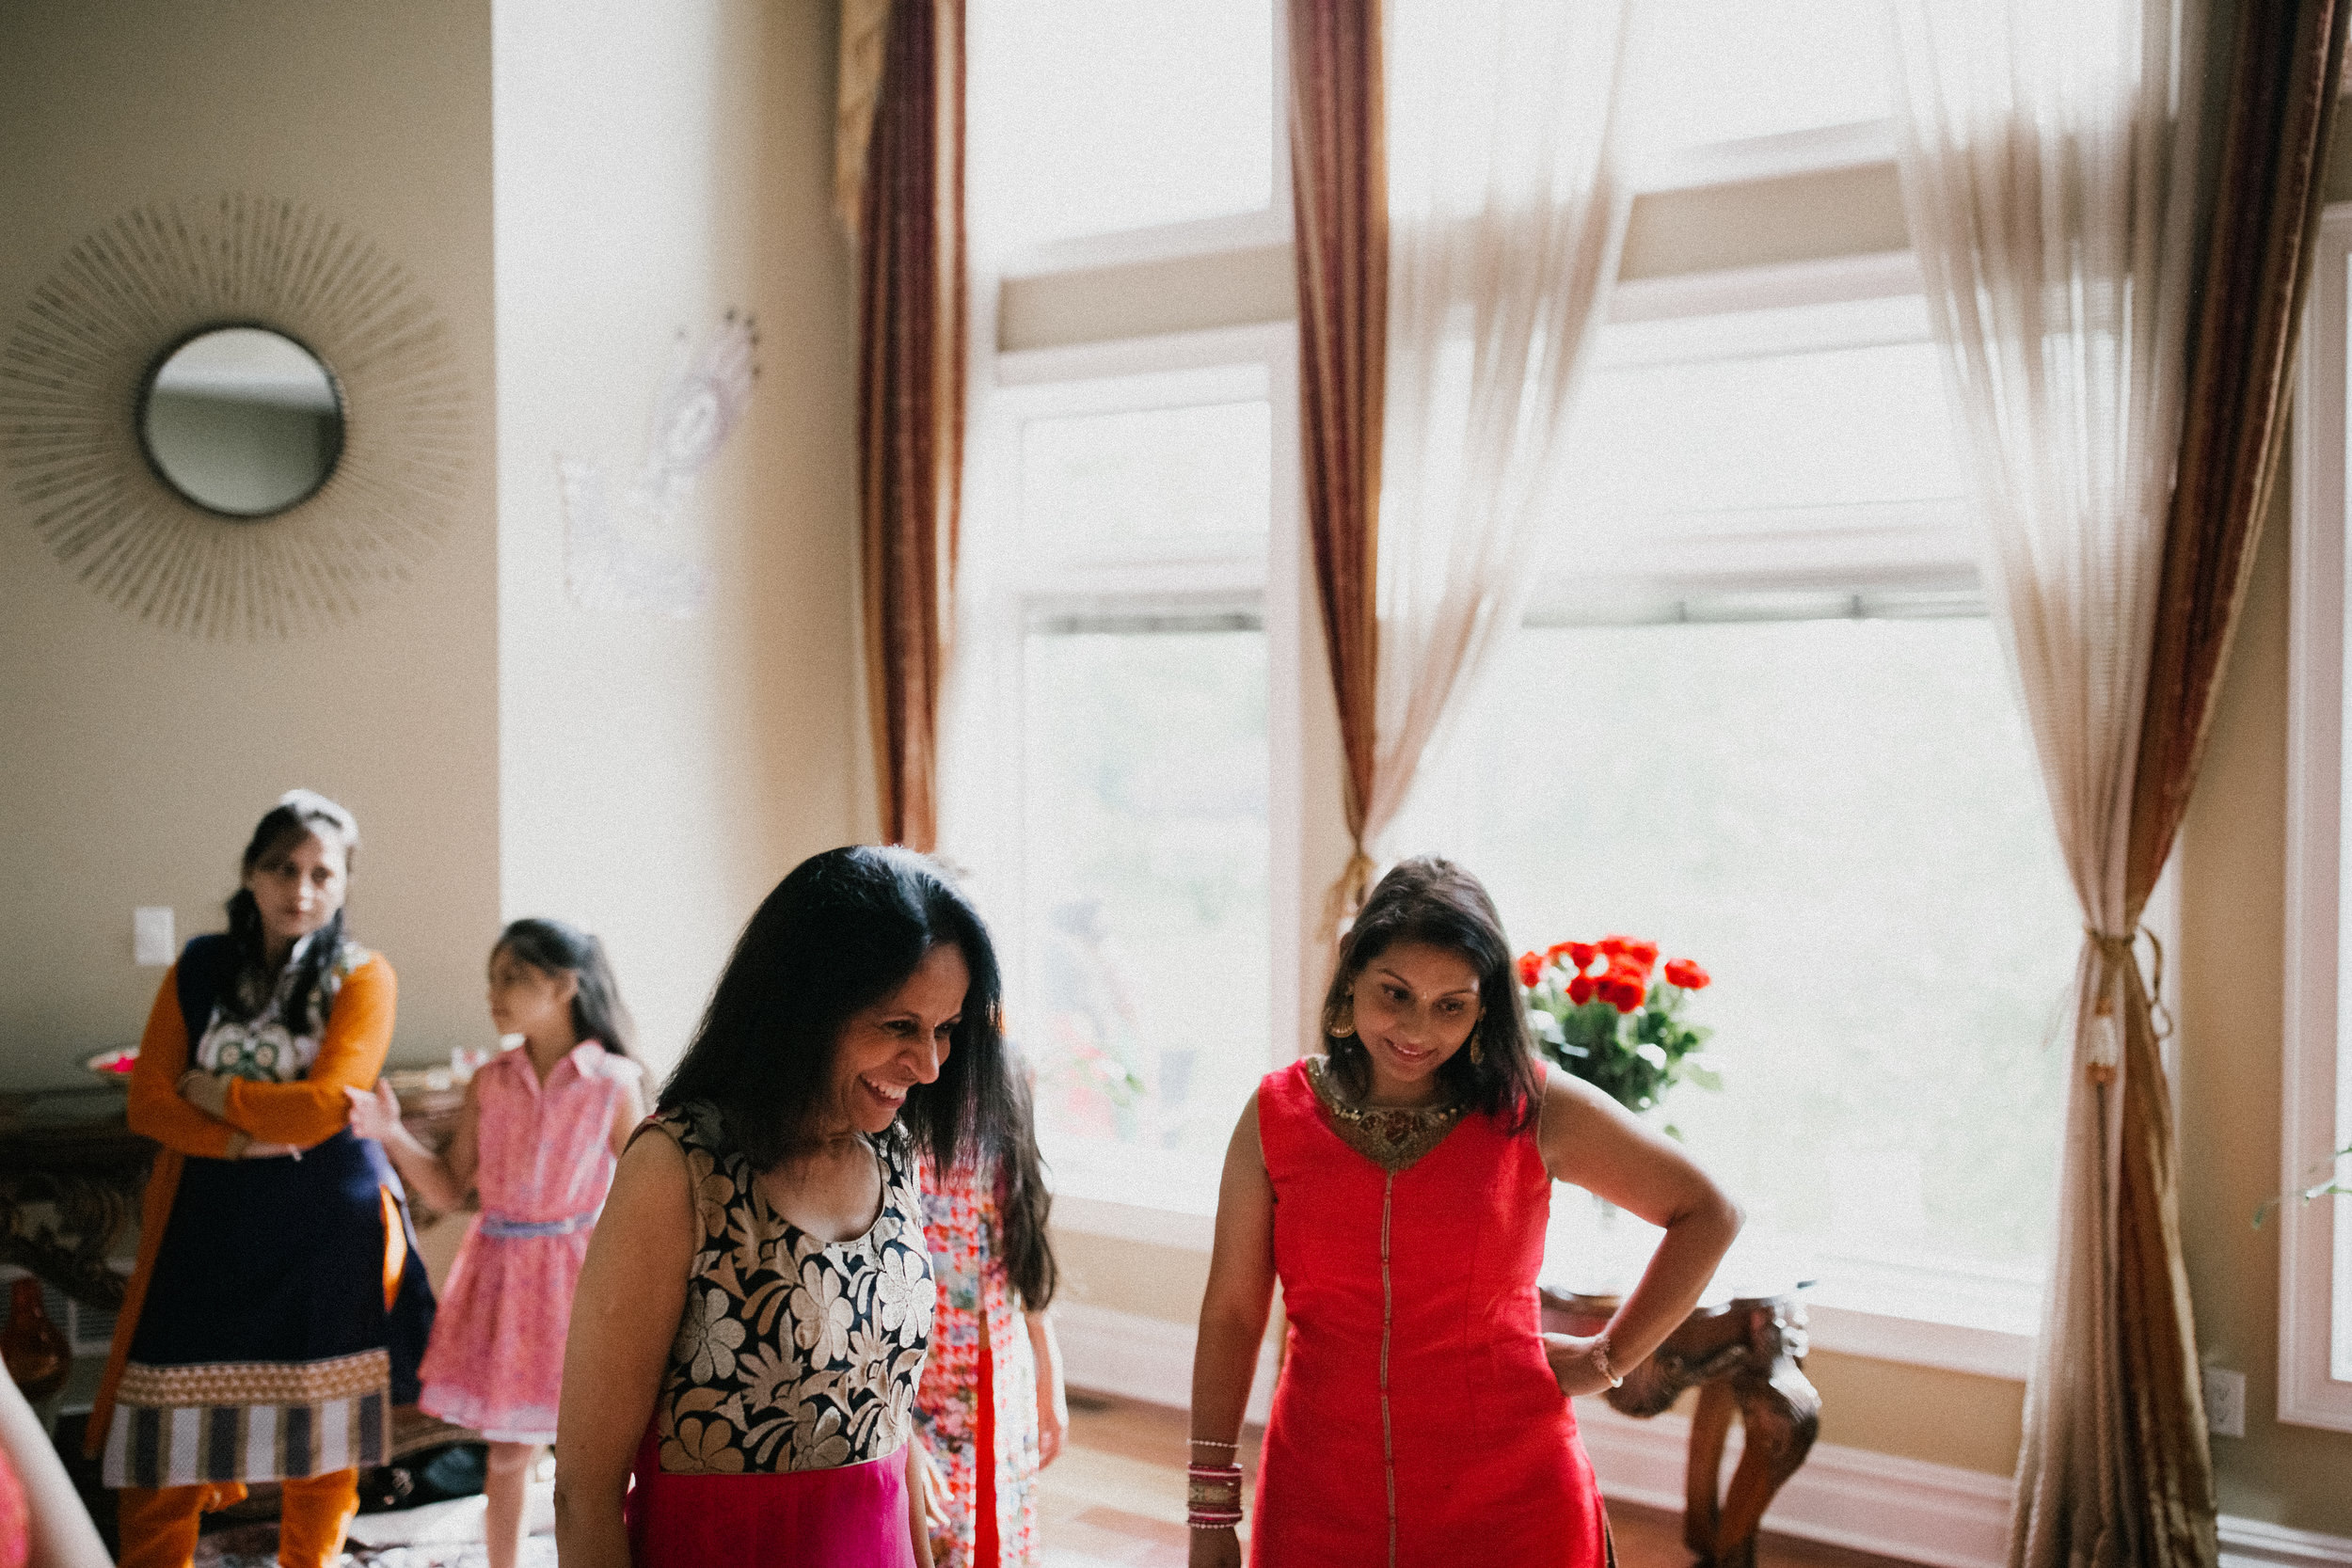 Aparna-Ankit-Patel-Mehndi-Wedding-Photos-0012.jpg